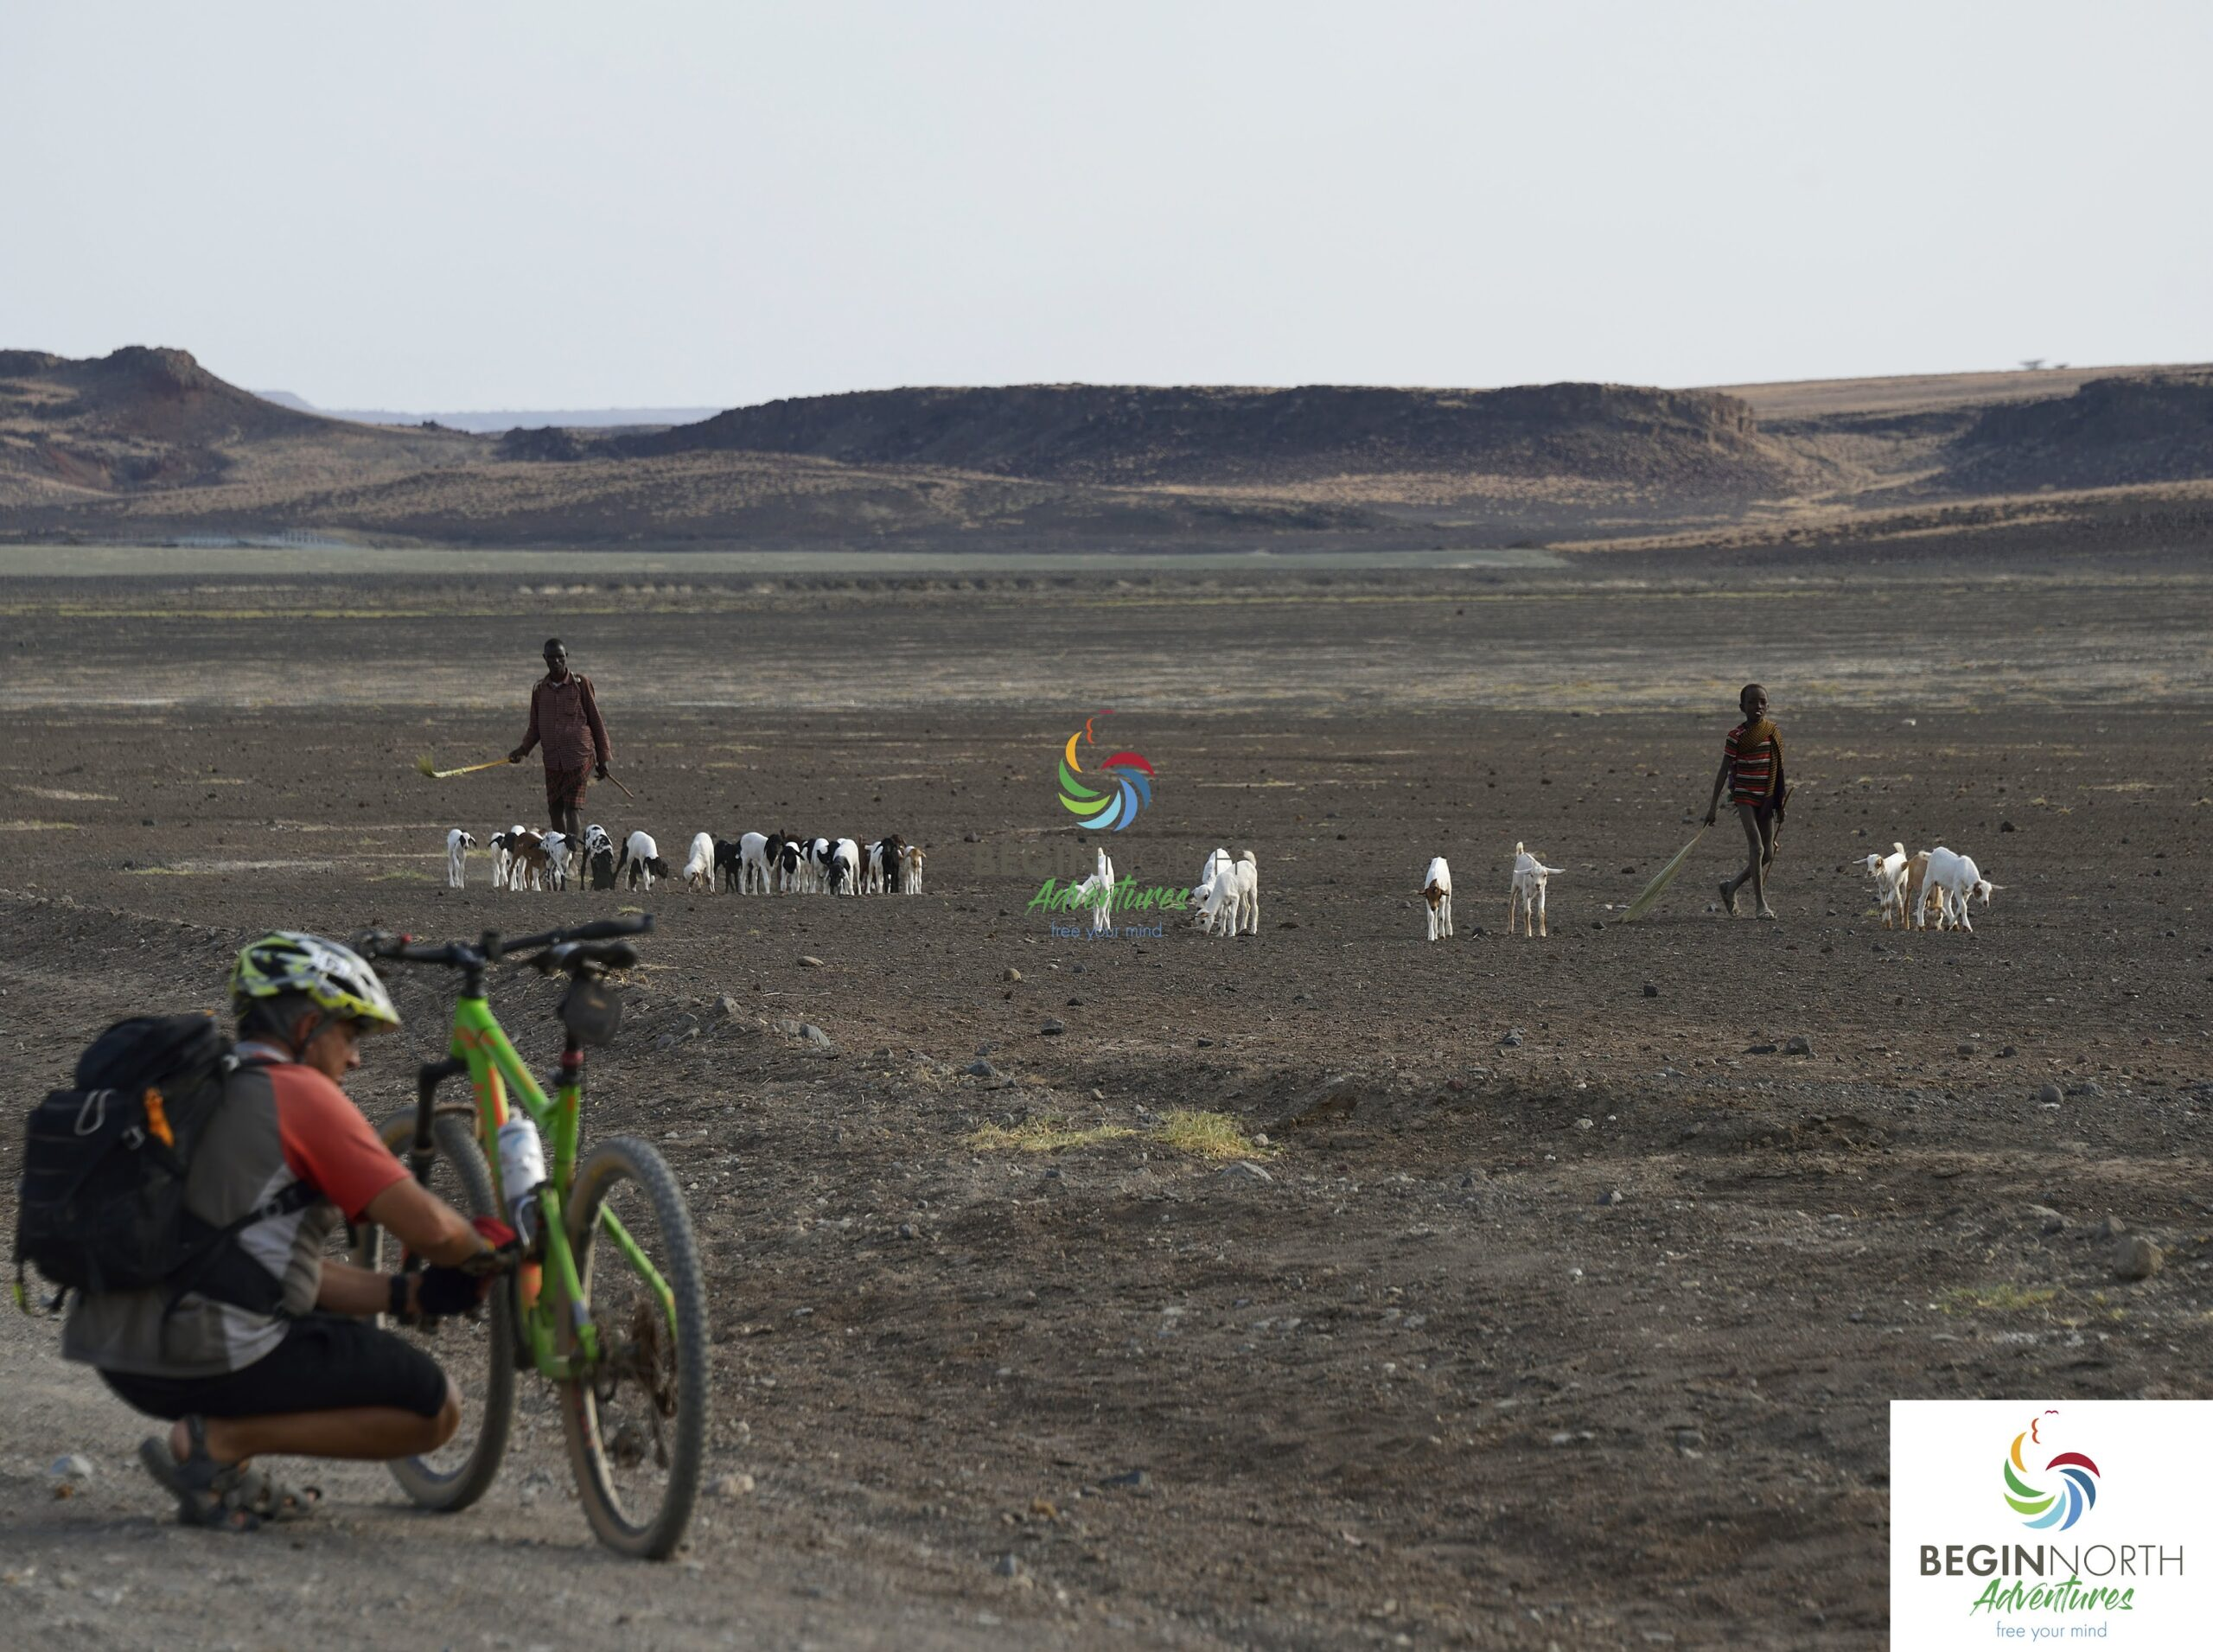 The Ultimate Kenya Desert Safari (with Photos and Video)